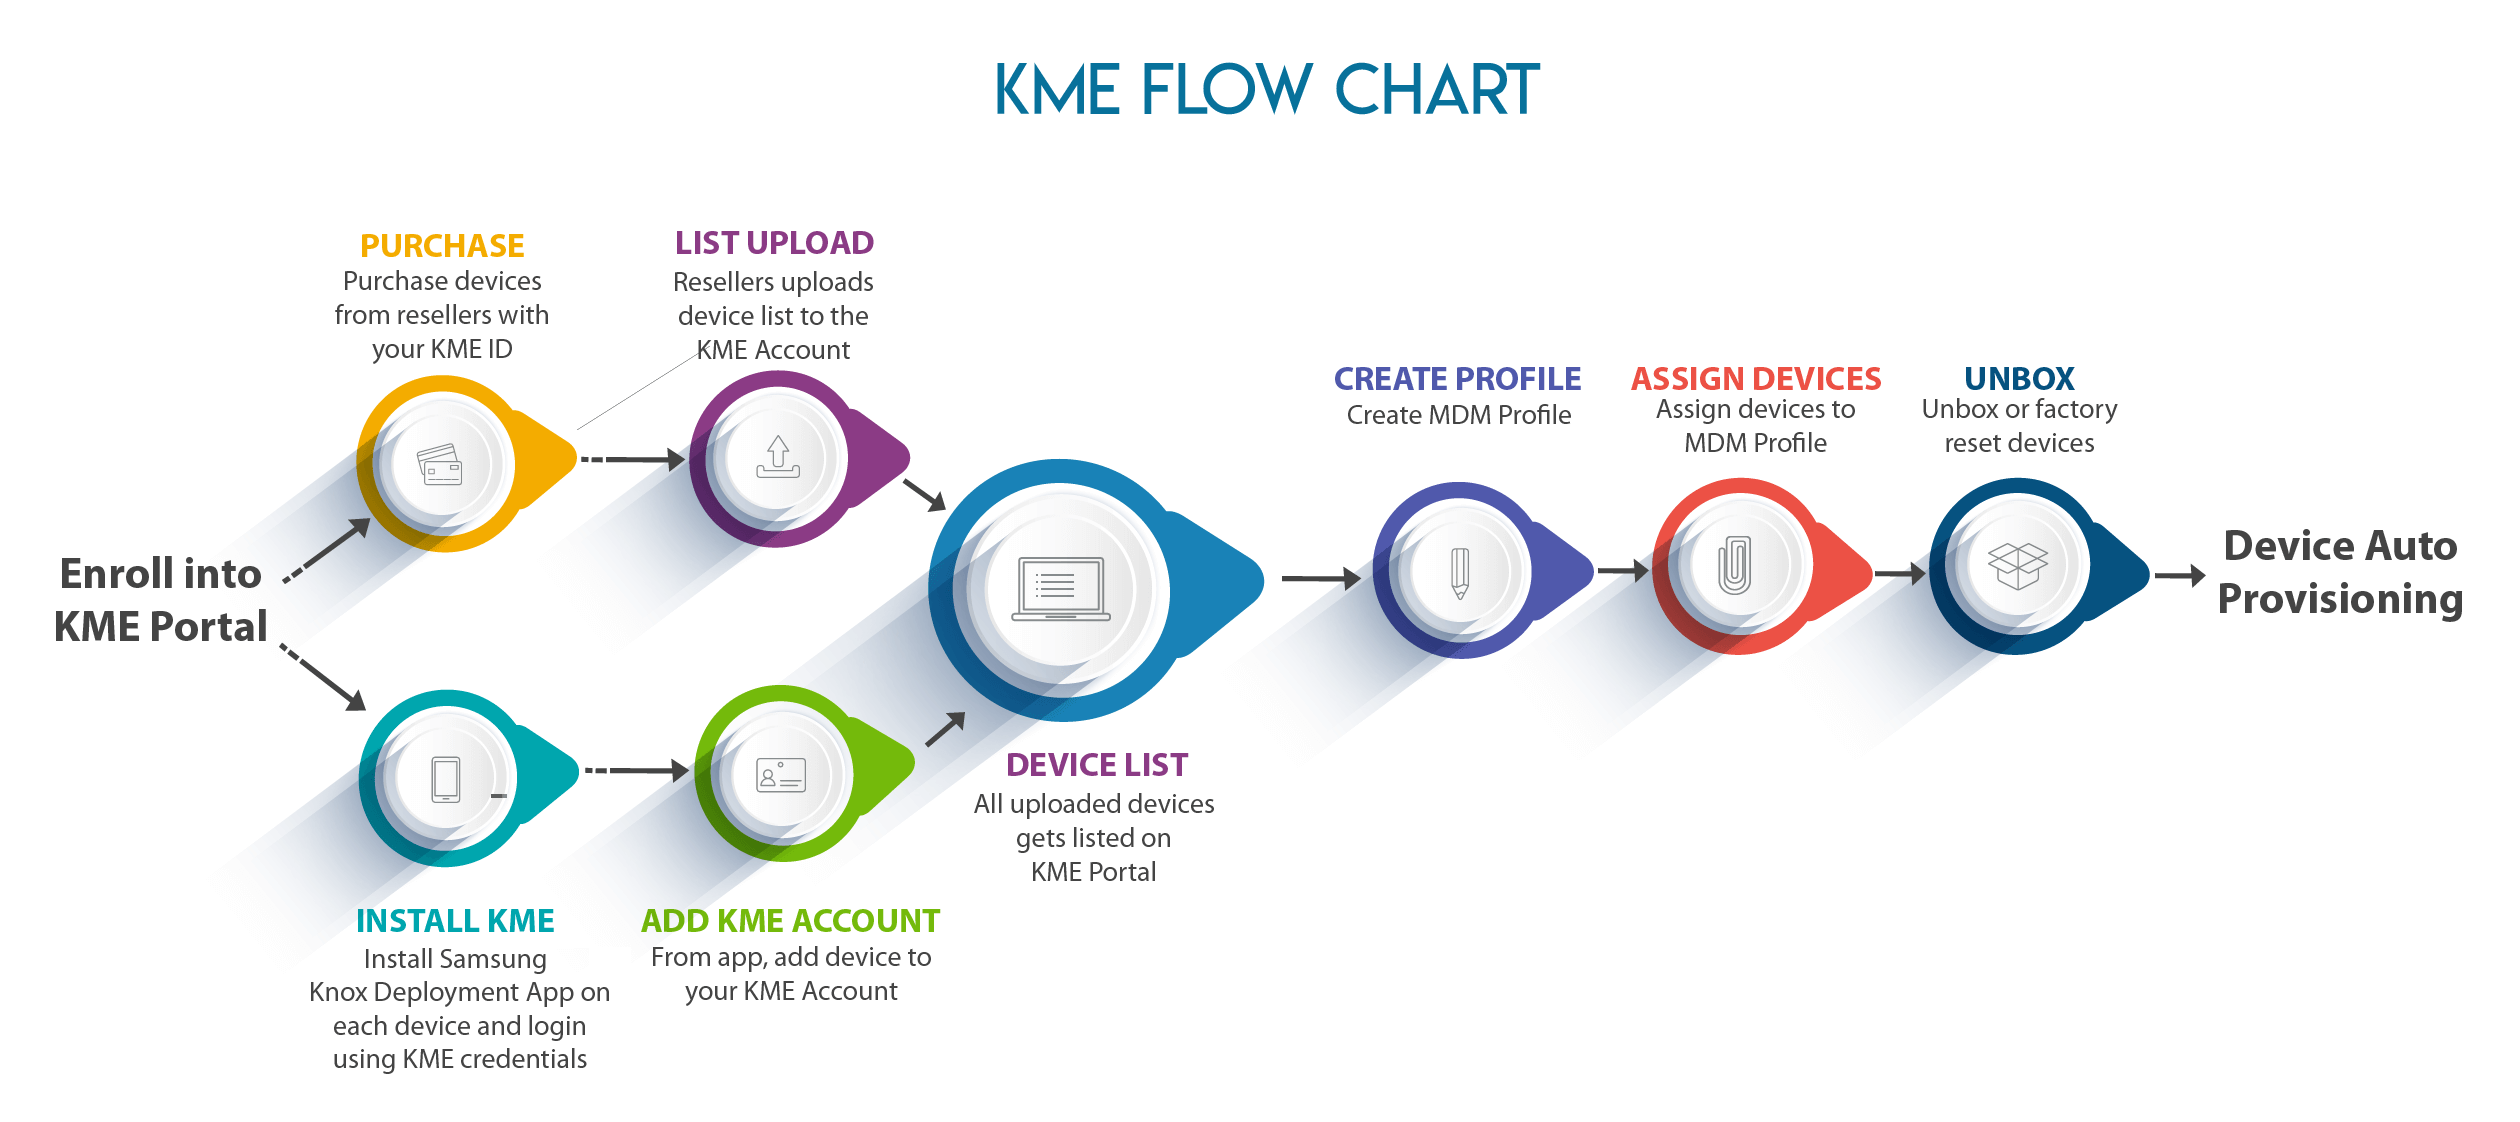 Samsung Knox Mobile Enrollment | Knox Deployment Program |